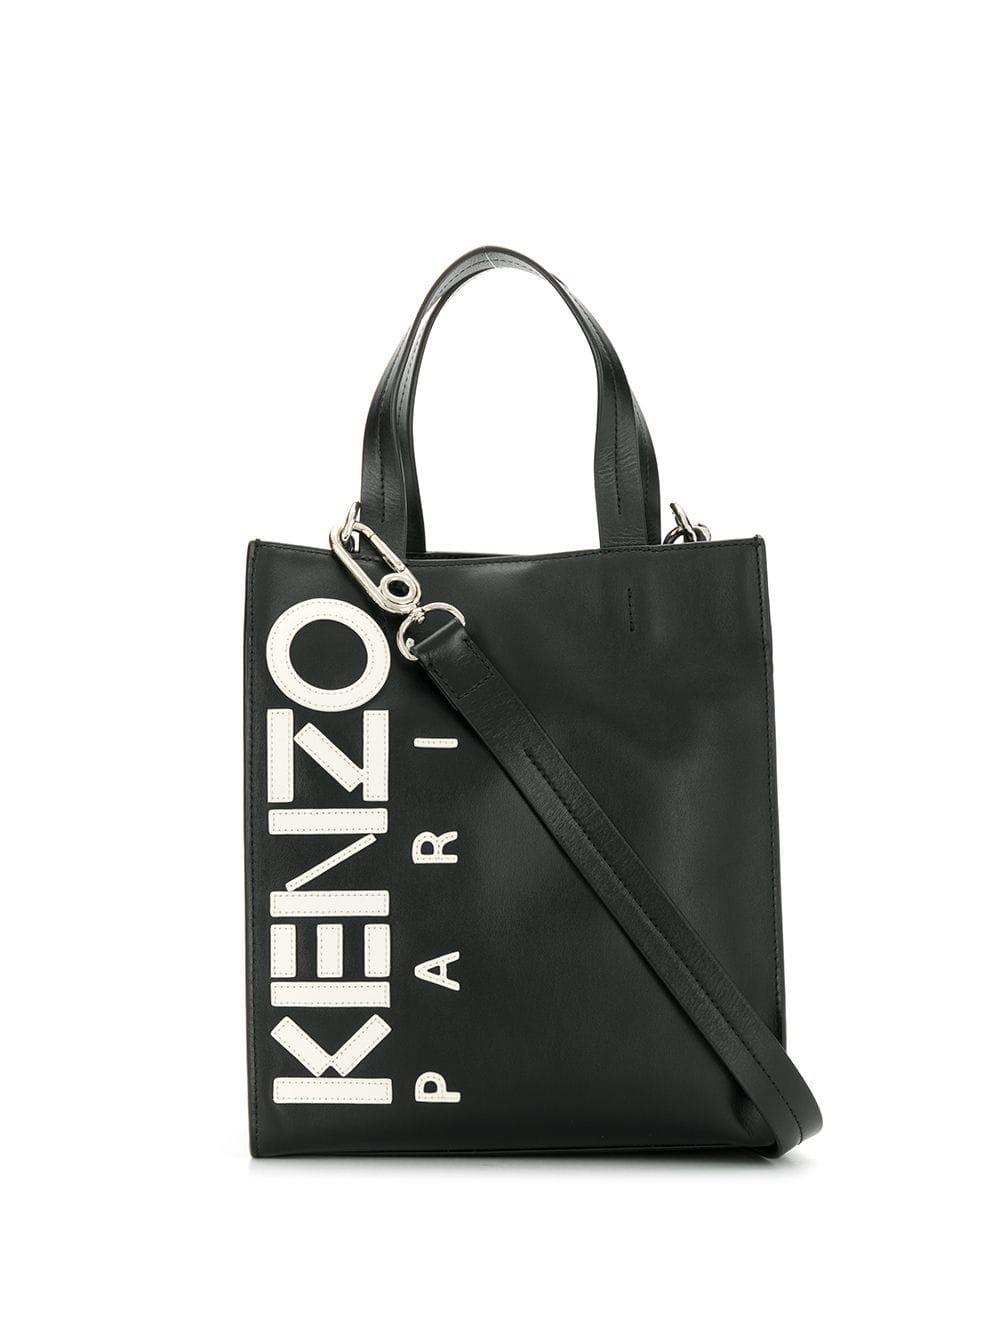 ac73137e Kenzo Kontrast tote bag - Black in 2019   Products   Bags, Kenzo ...